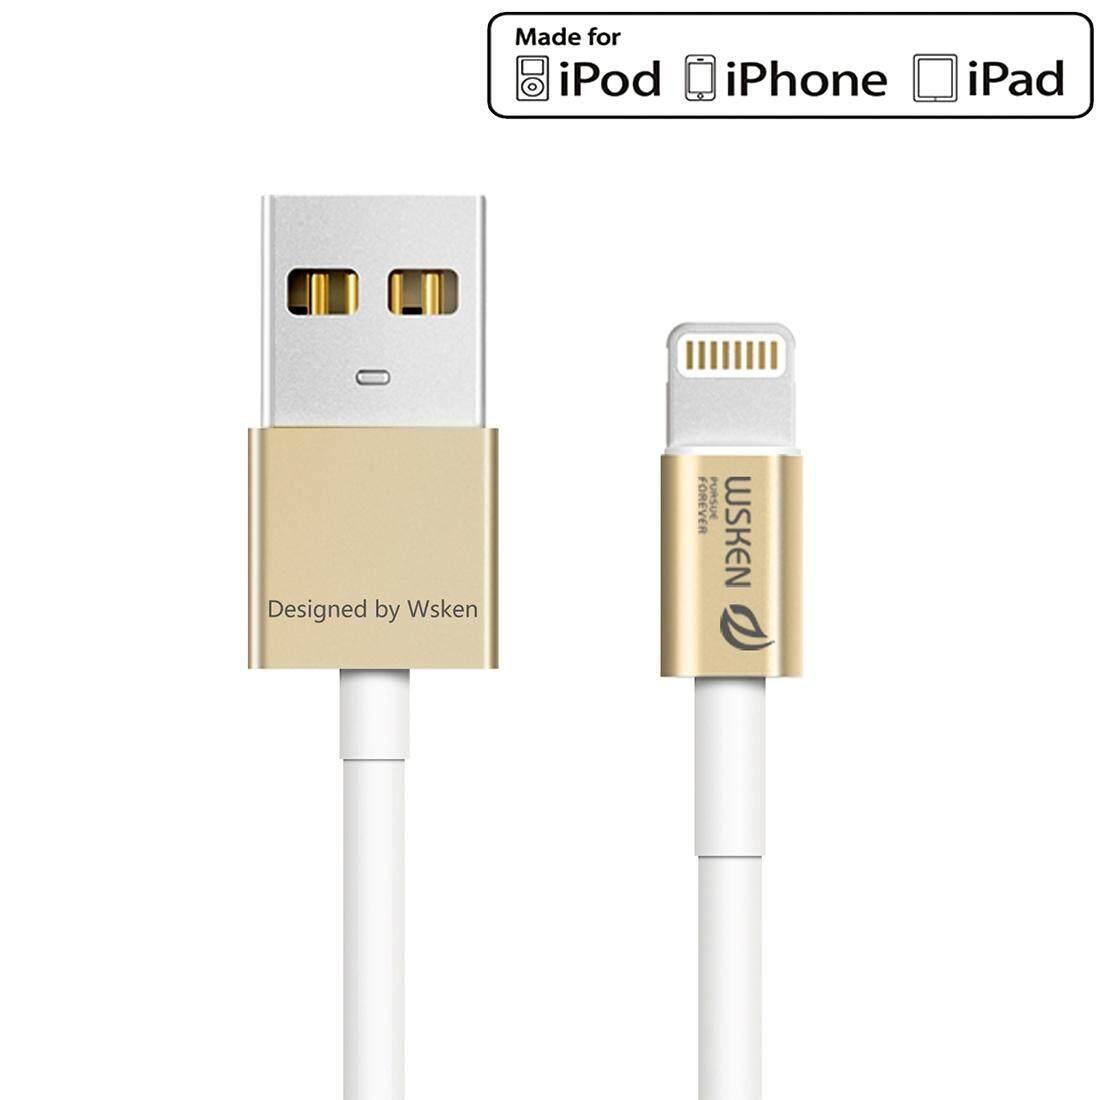 Jual Wsken X Murah Garansi Dan Berkualitas Id Store Apple Usb Lightning Kabel Data Iphone 6 Plus5 S Rp 278000